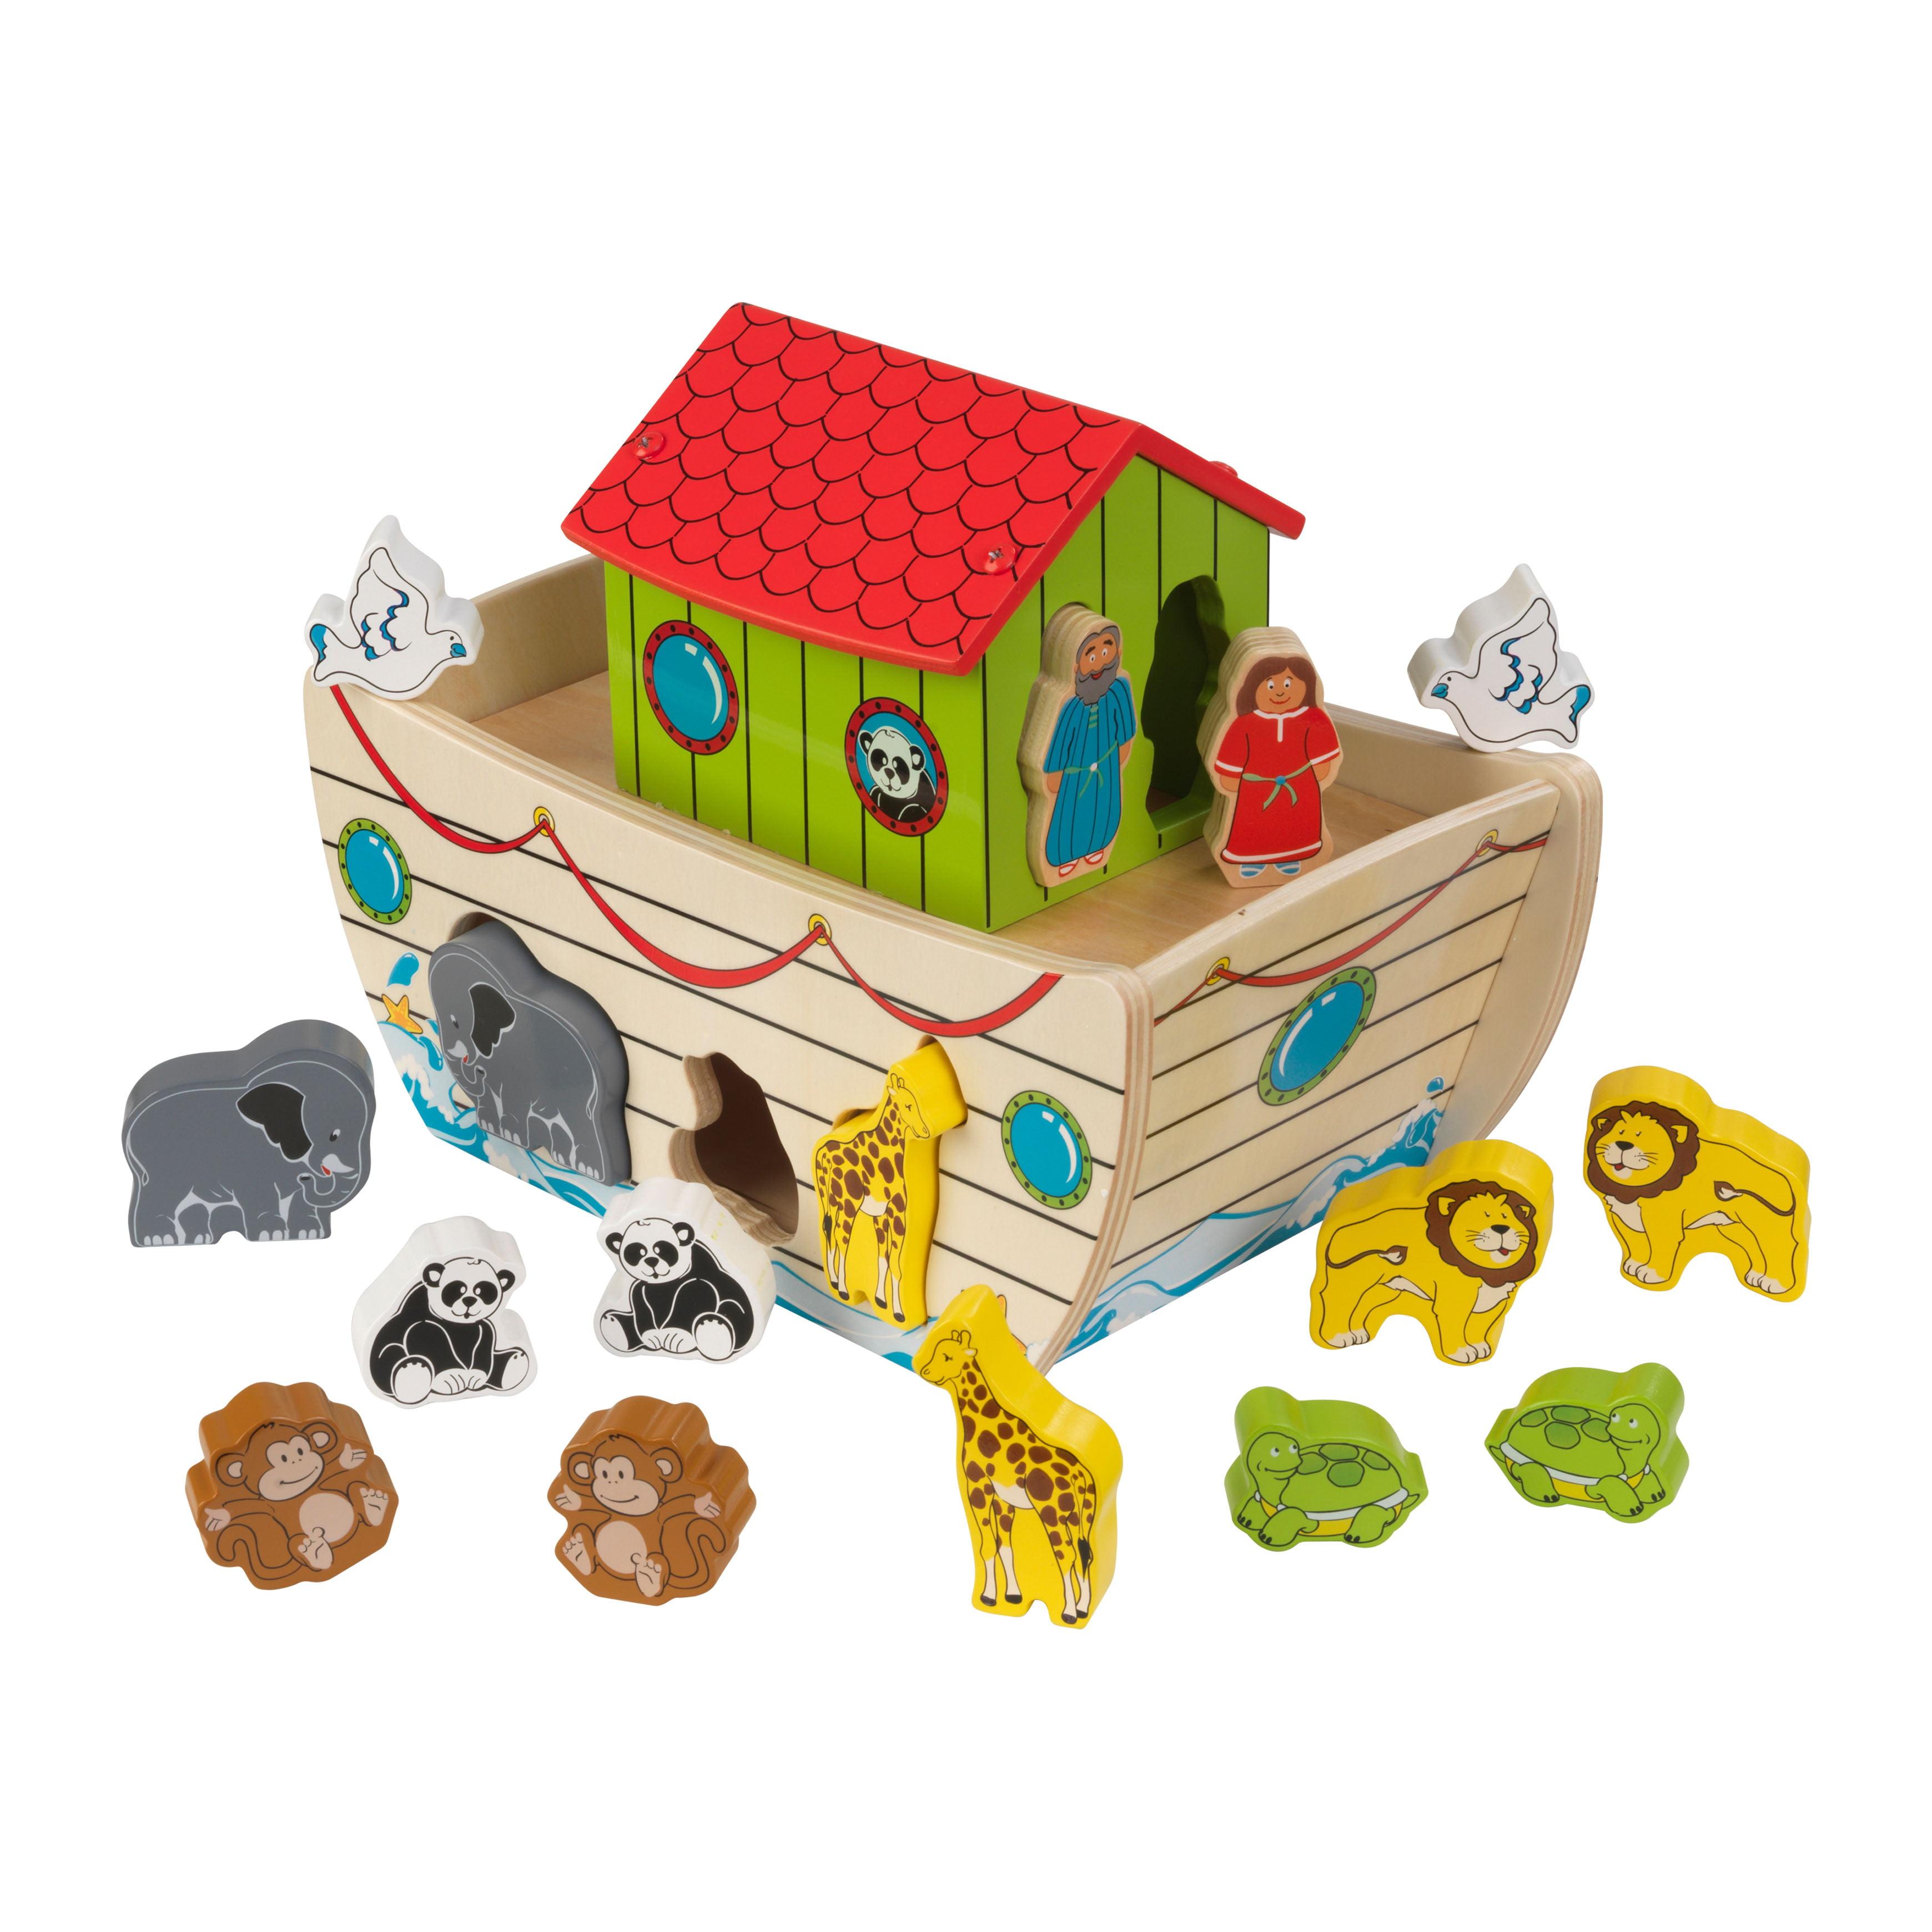 KidKraft Noah's Ark Shape Shorter with 17 Wooden Pieces, Toddler and Preschooler Toy Playset